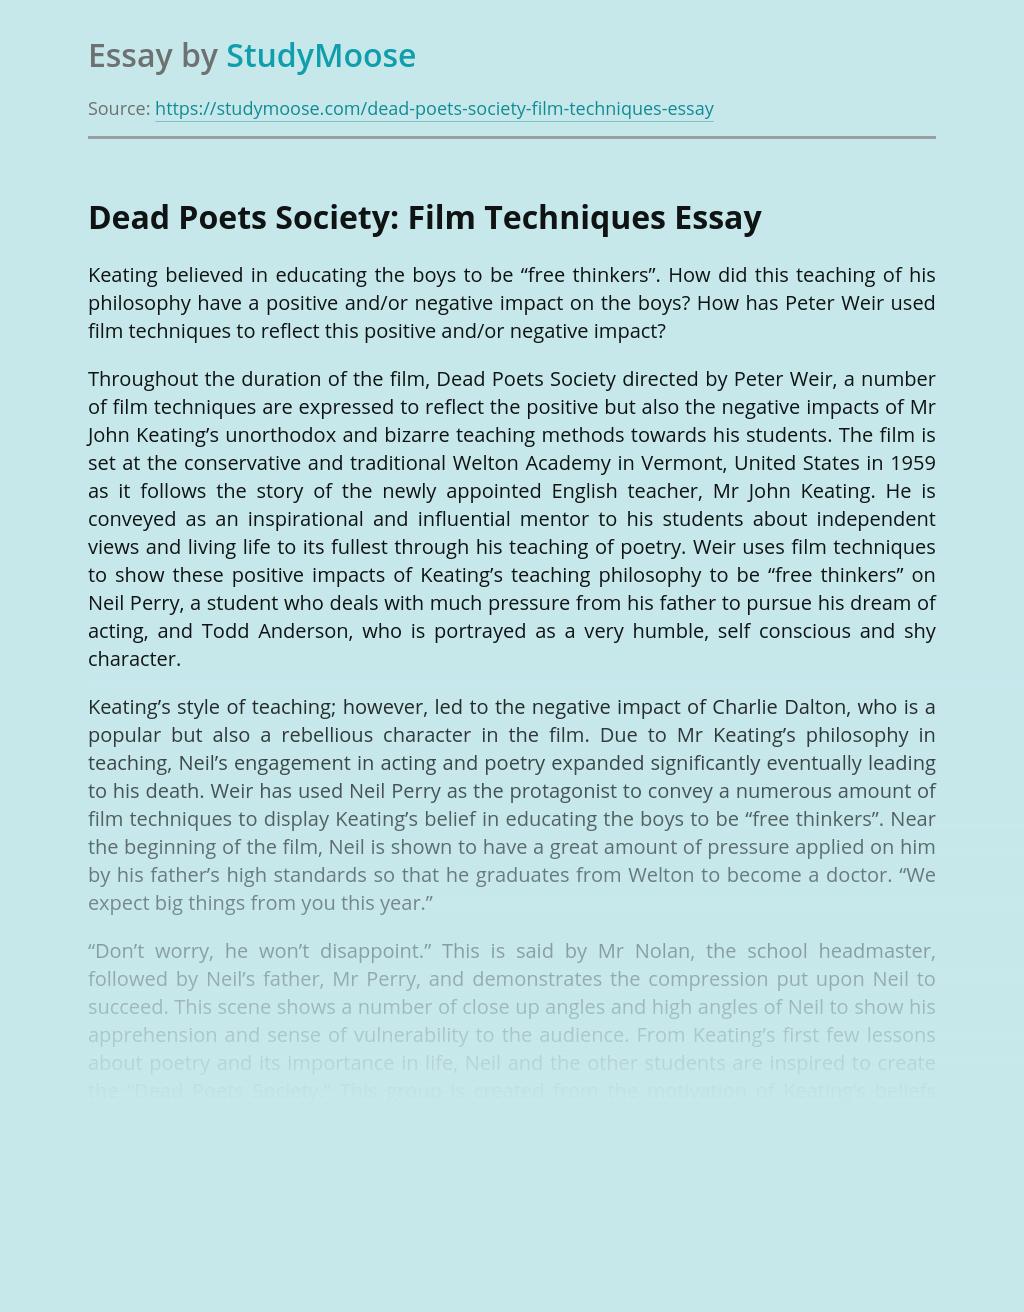 Dead Poets Society: Film Techniques